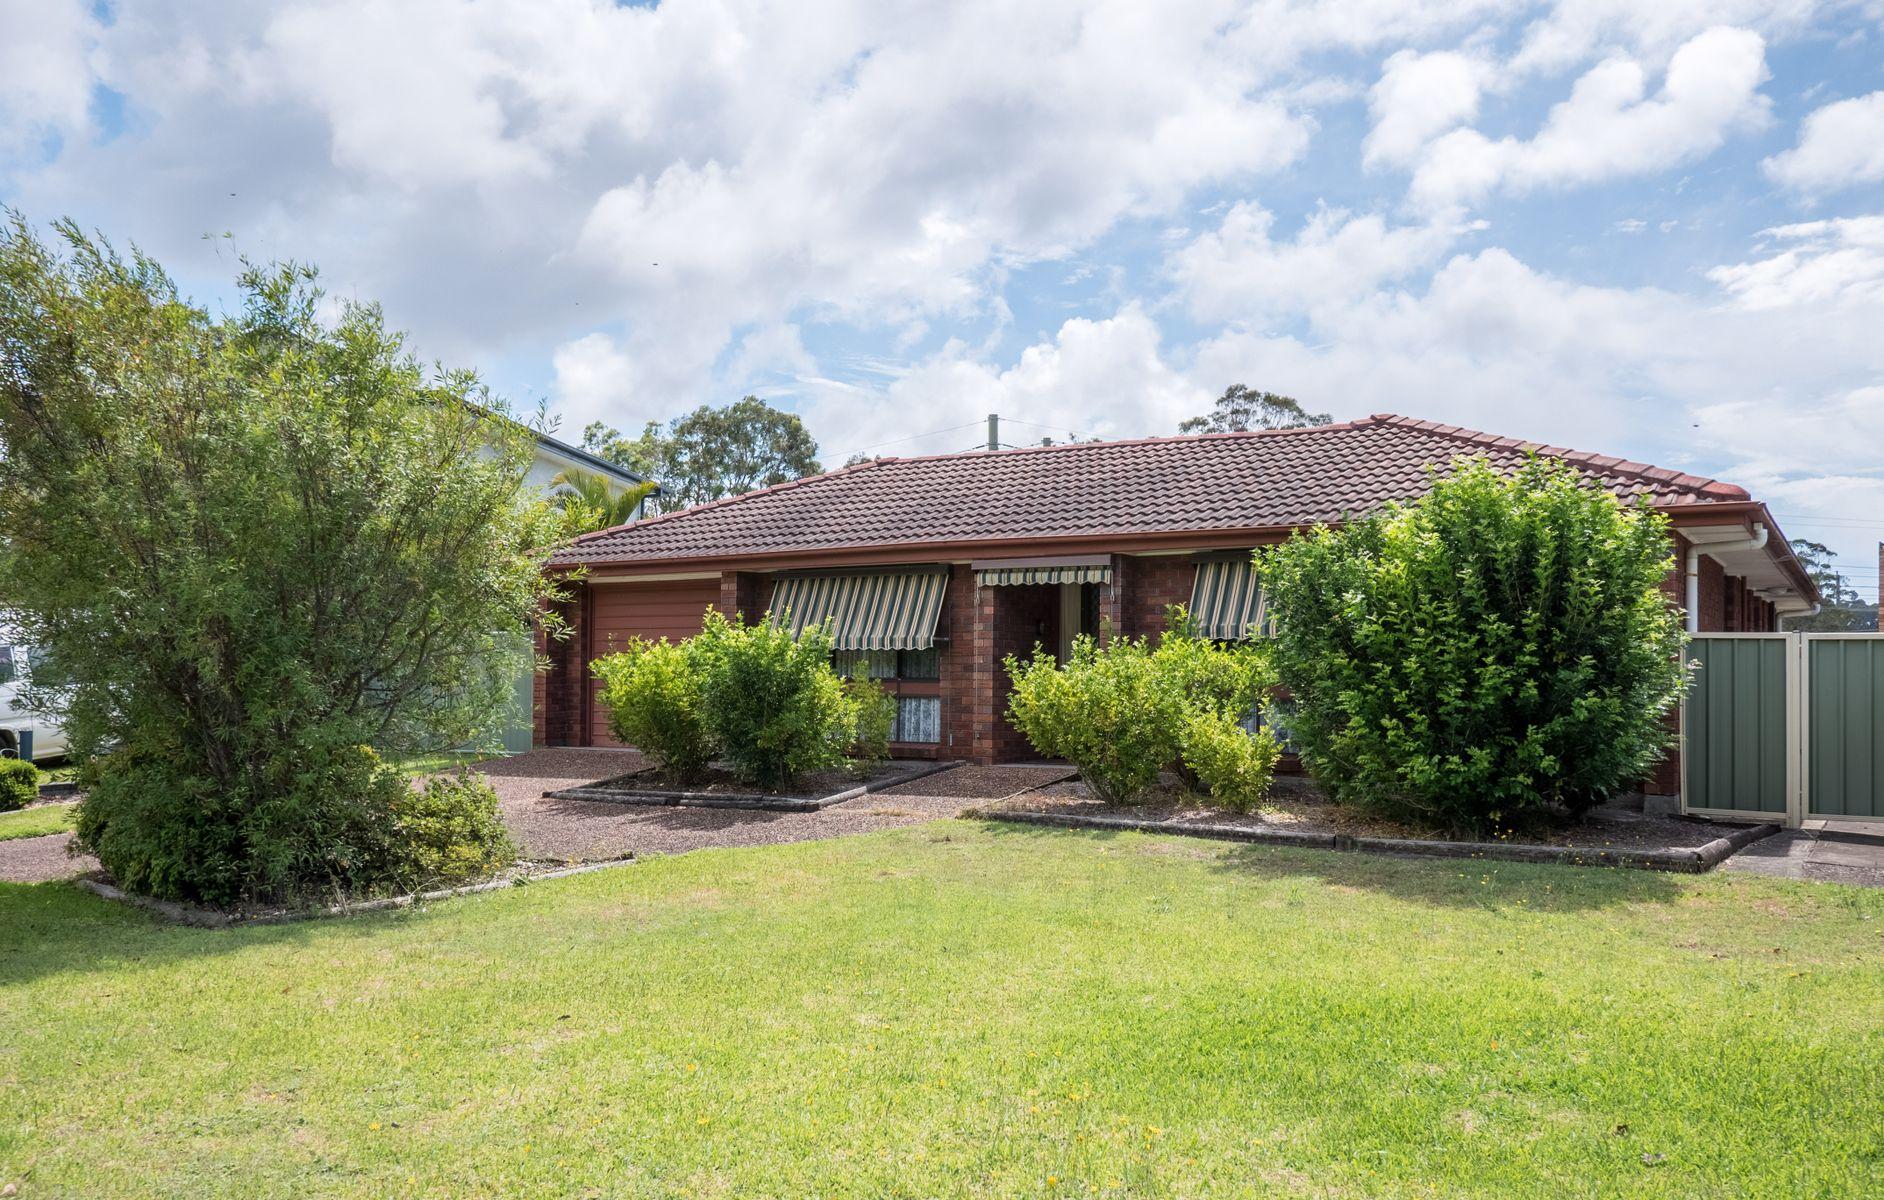 4 Bundarra Cl, Eleebana NSW 2282, Australia , House for Sale